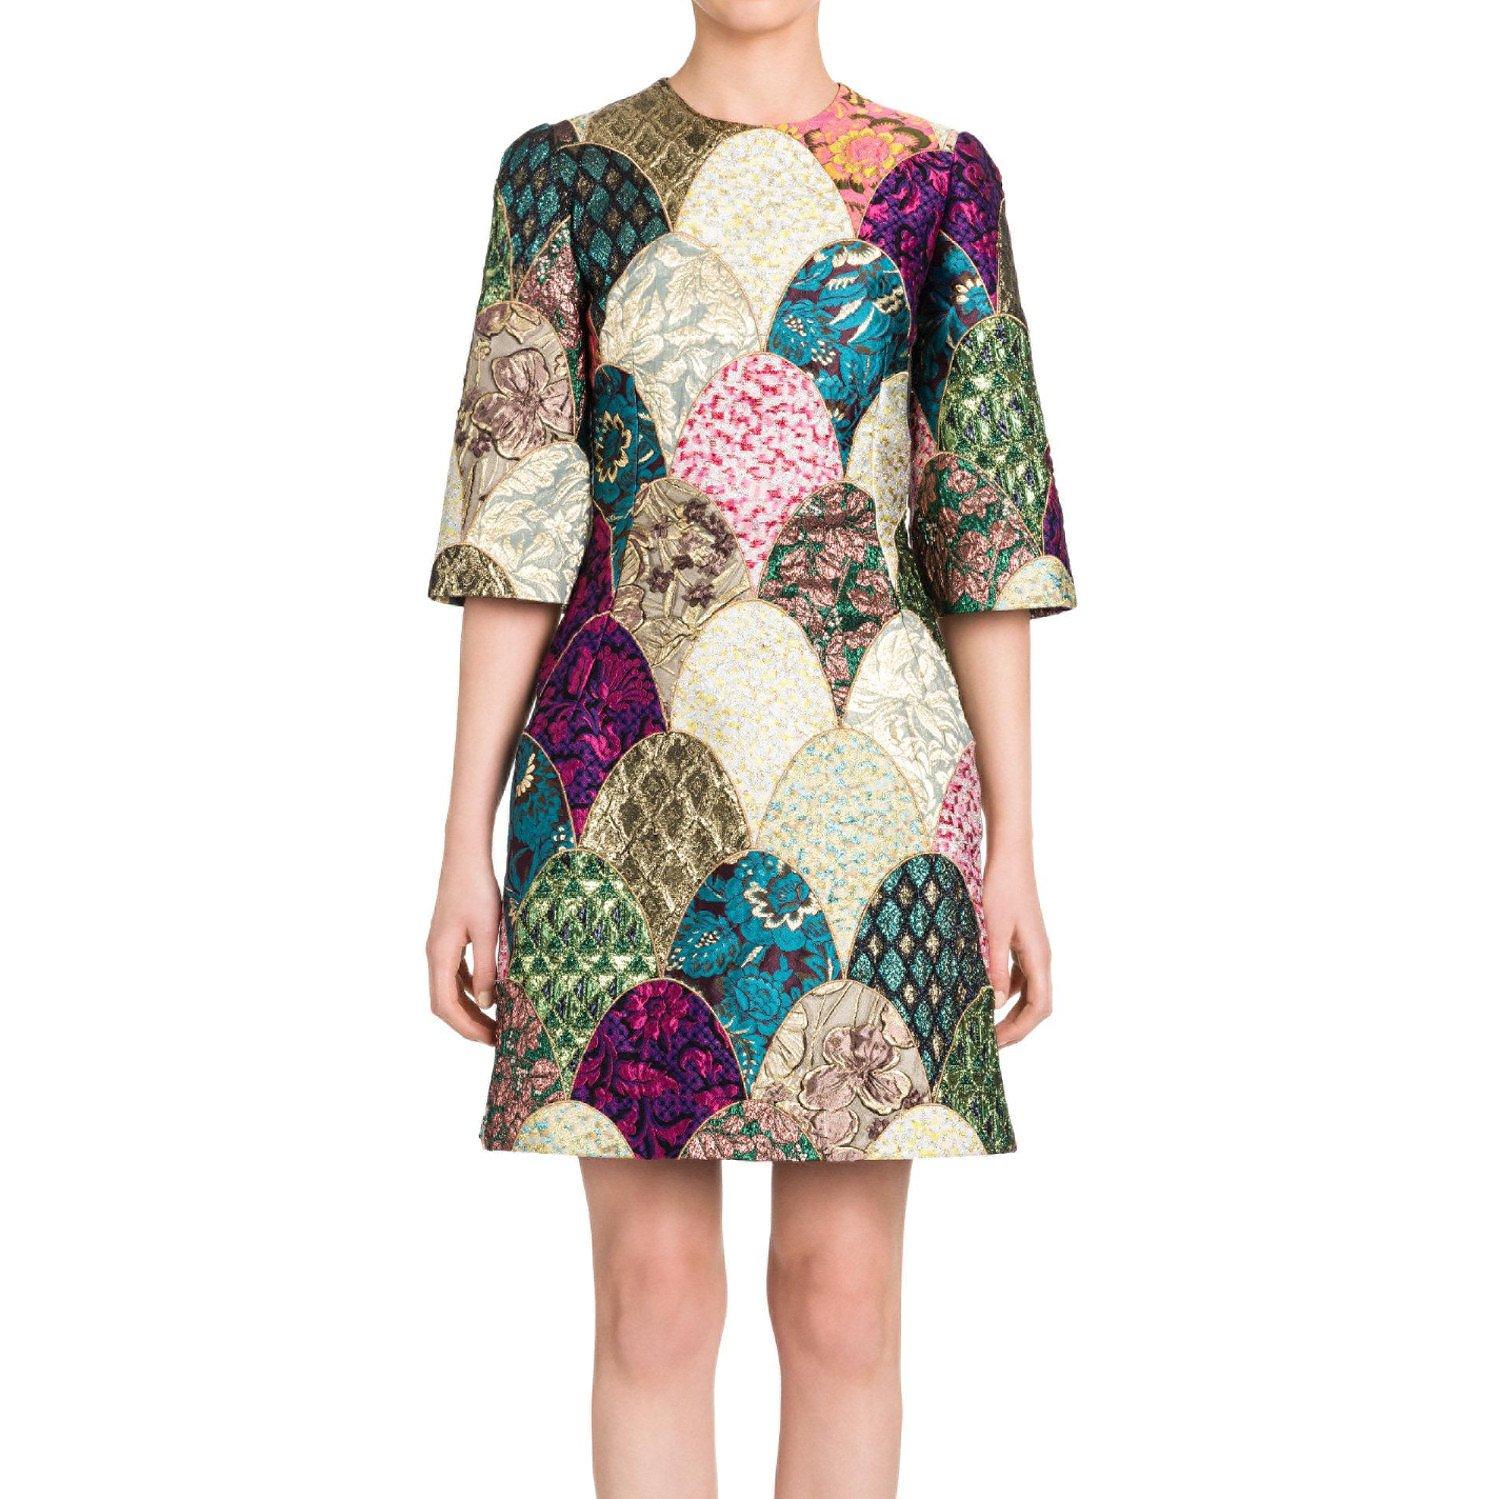 DOLCE & GABBANA Jacquard Patchwork Dress